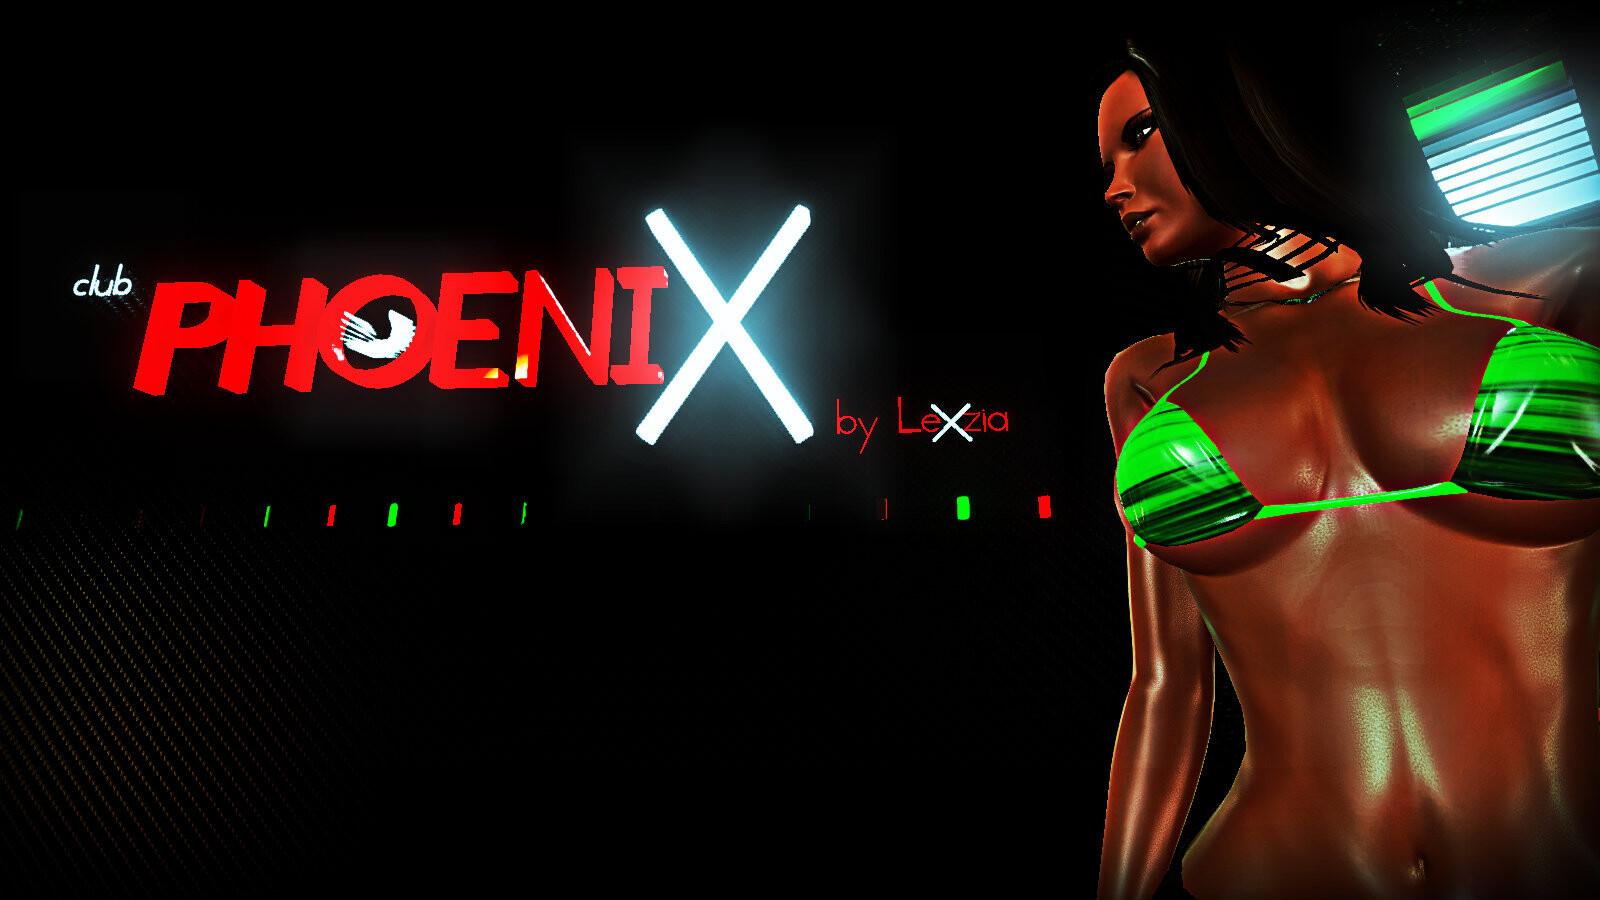 Club Phoenix 00